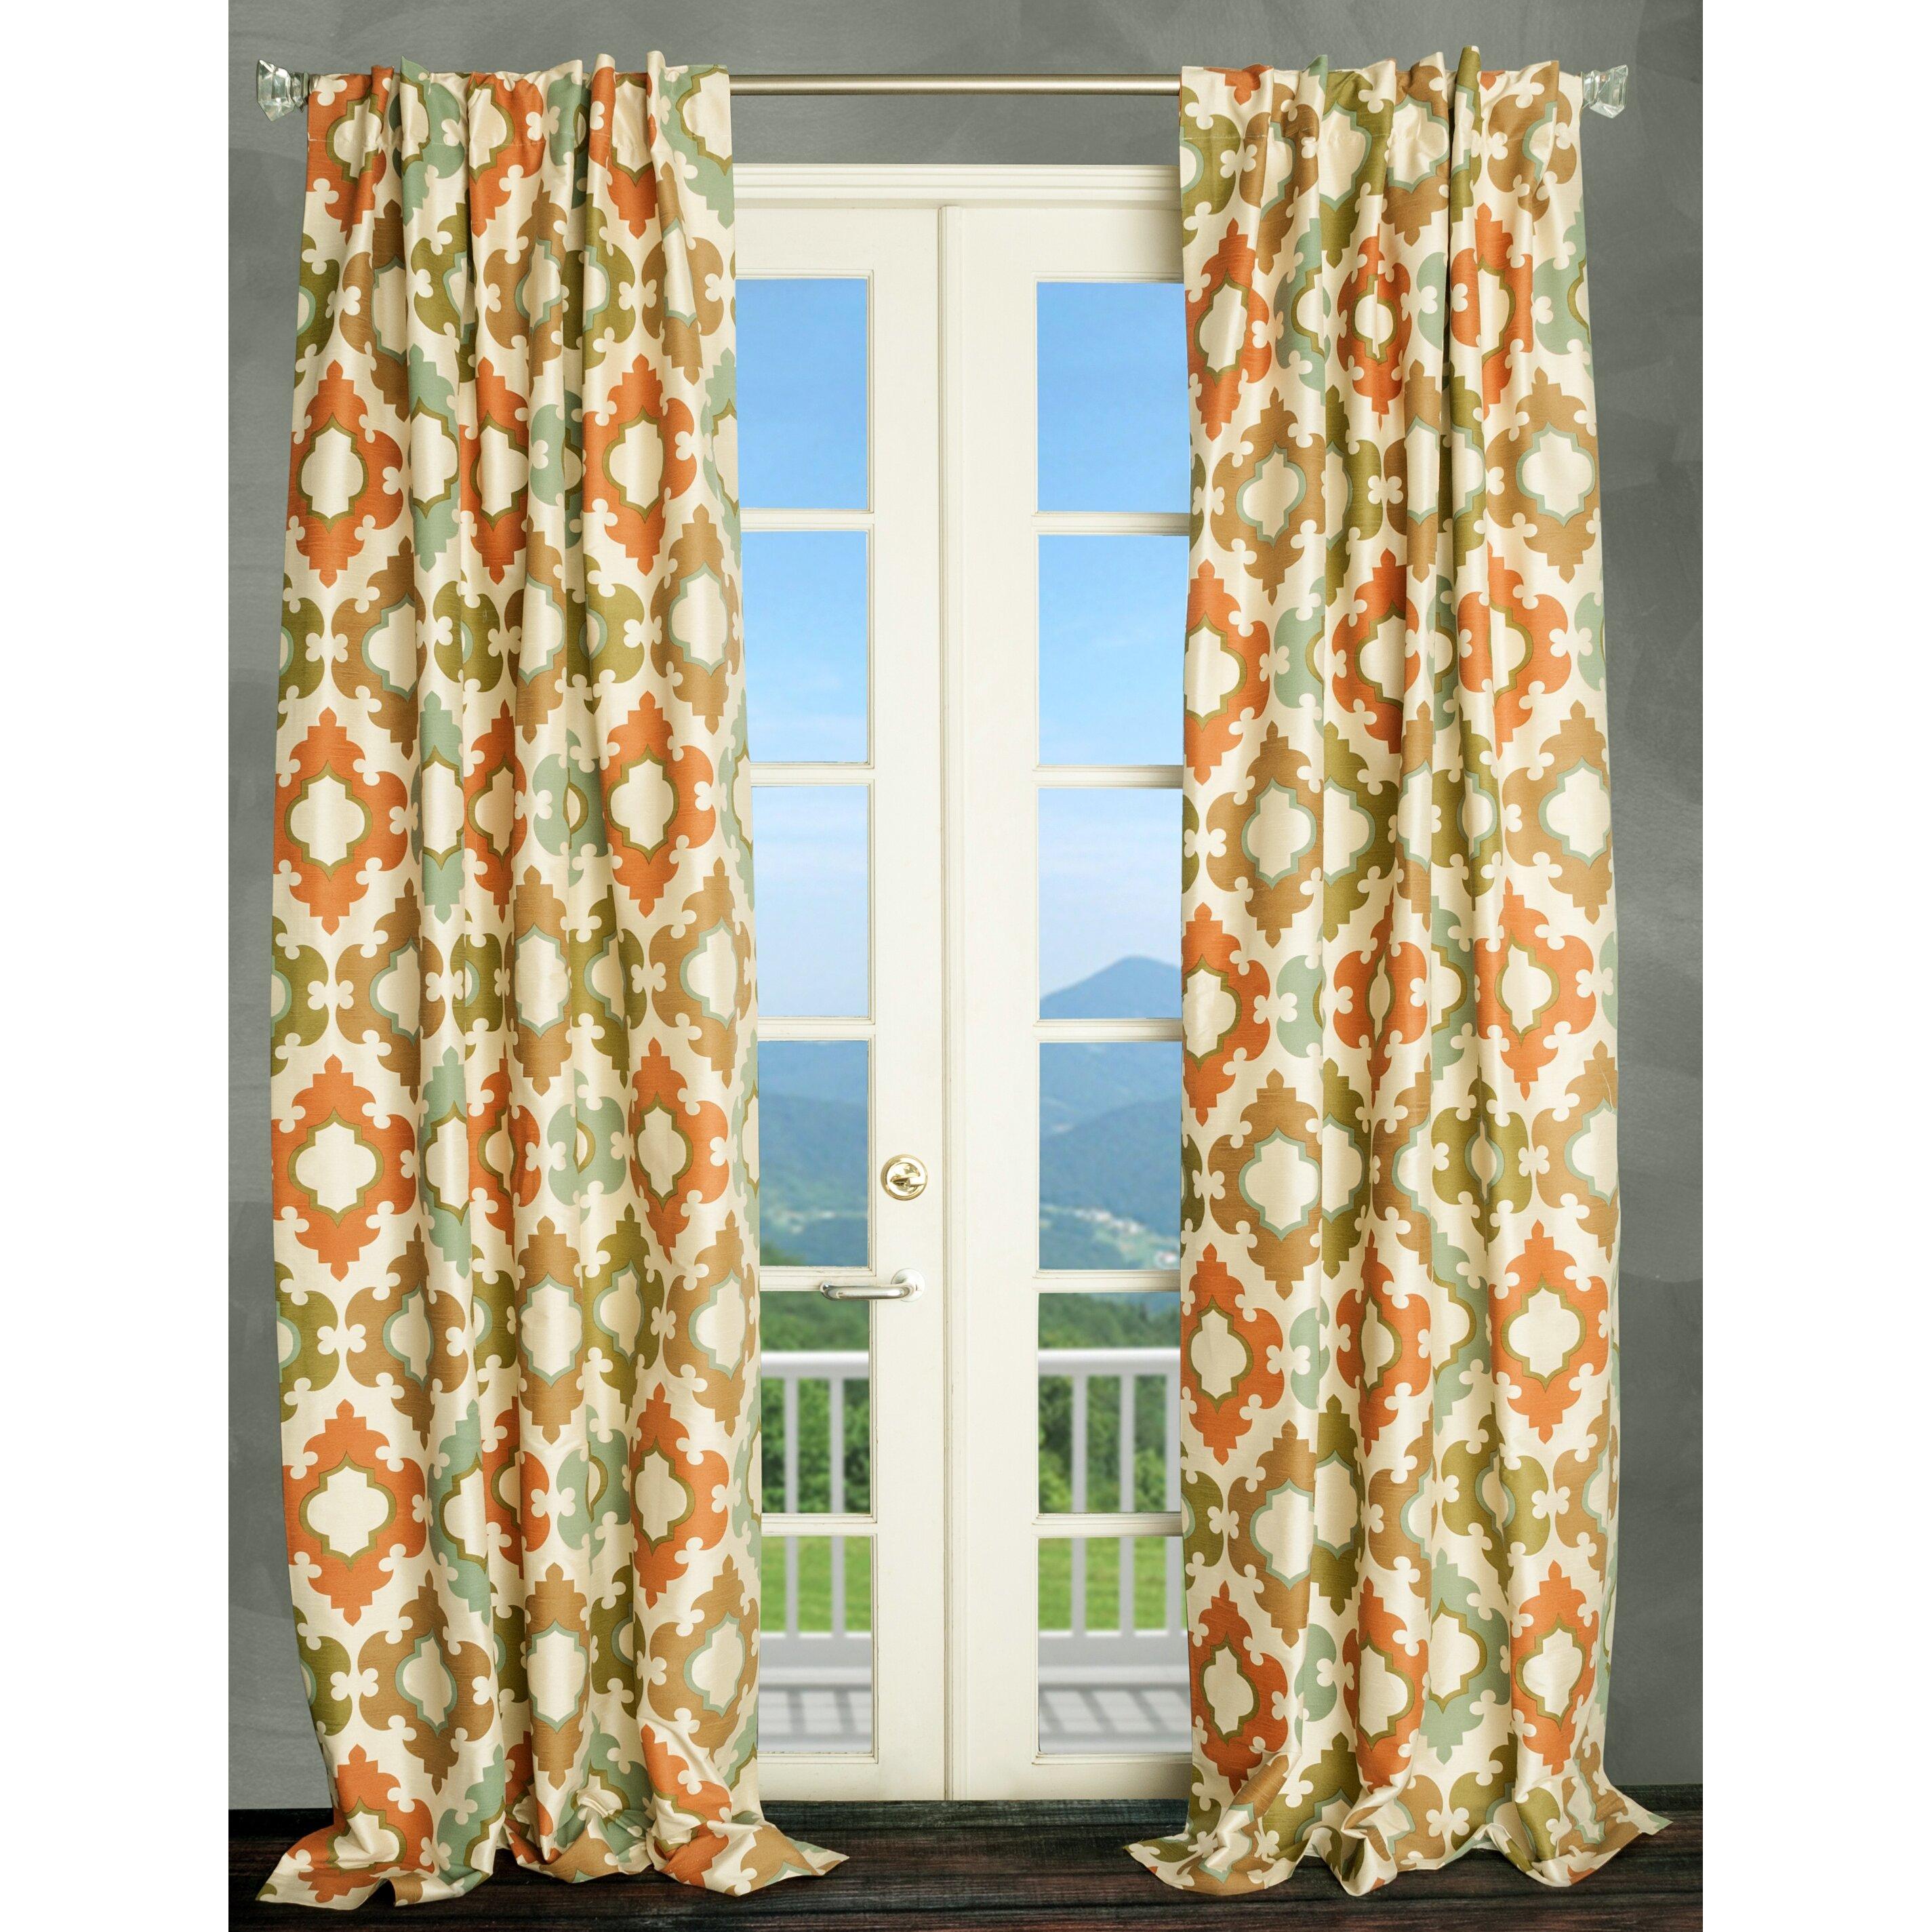 Parisian Home Style Damask Thermal Single Panel Curtain Liner Reviews Wayfair